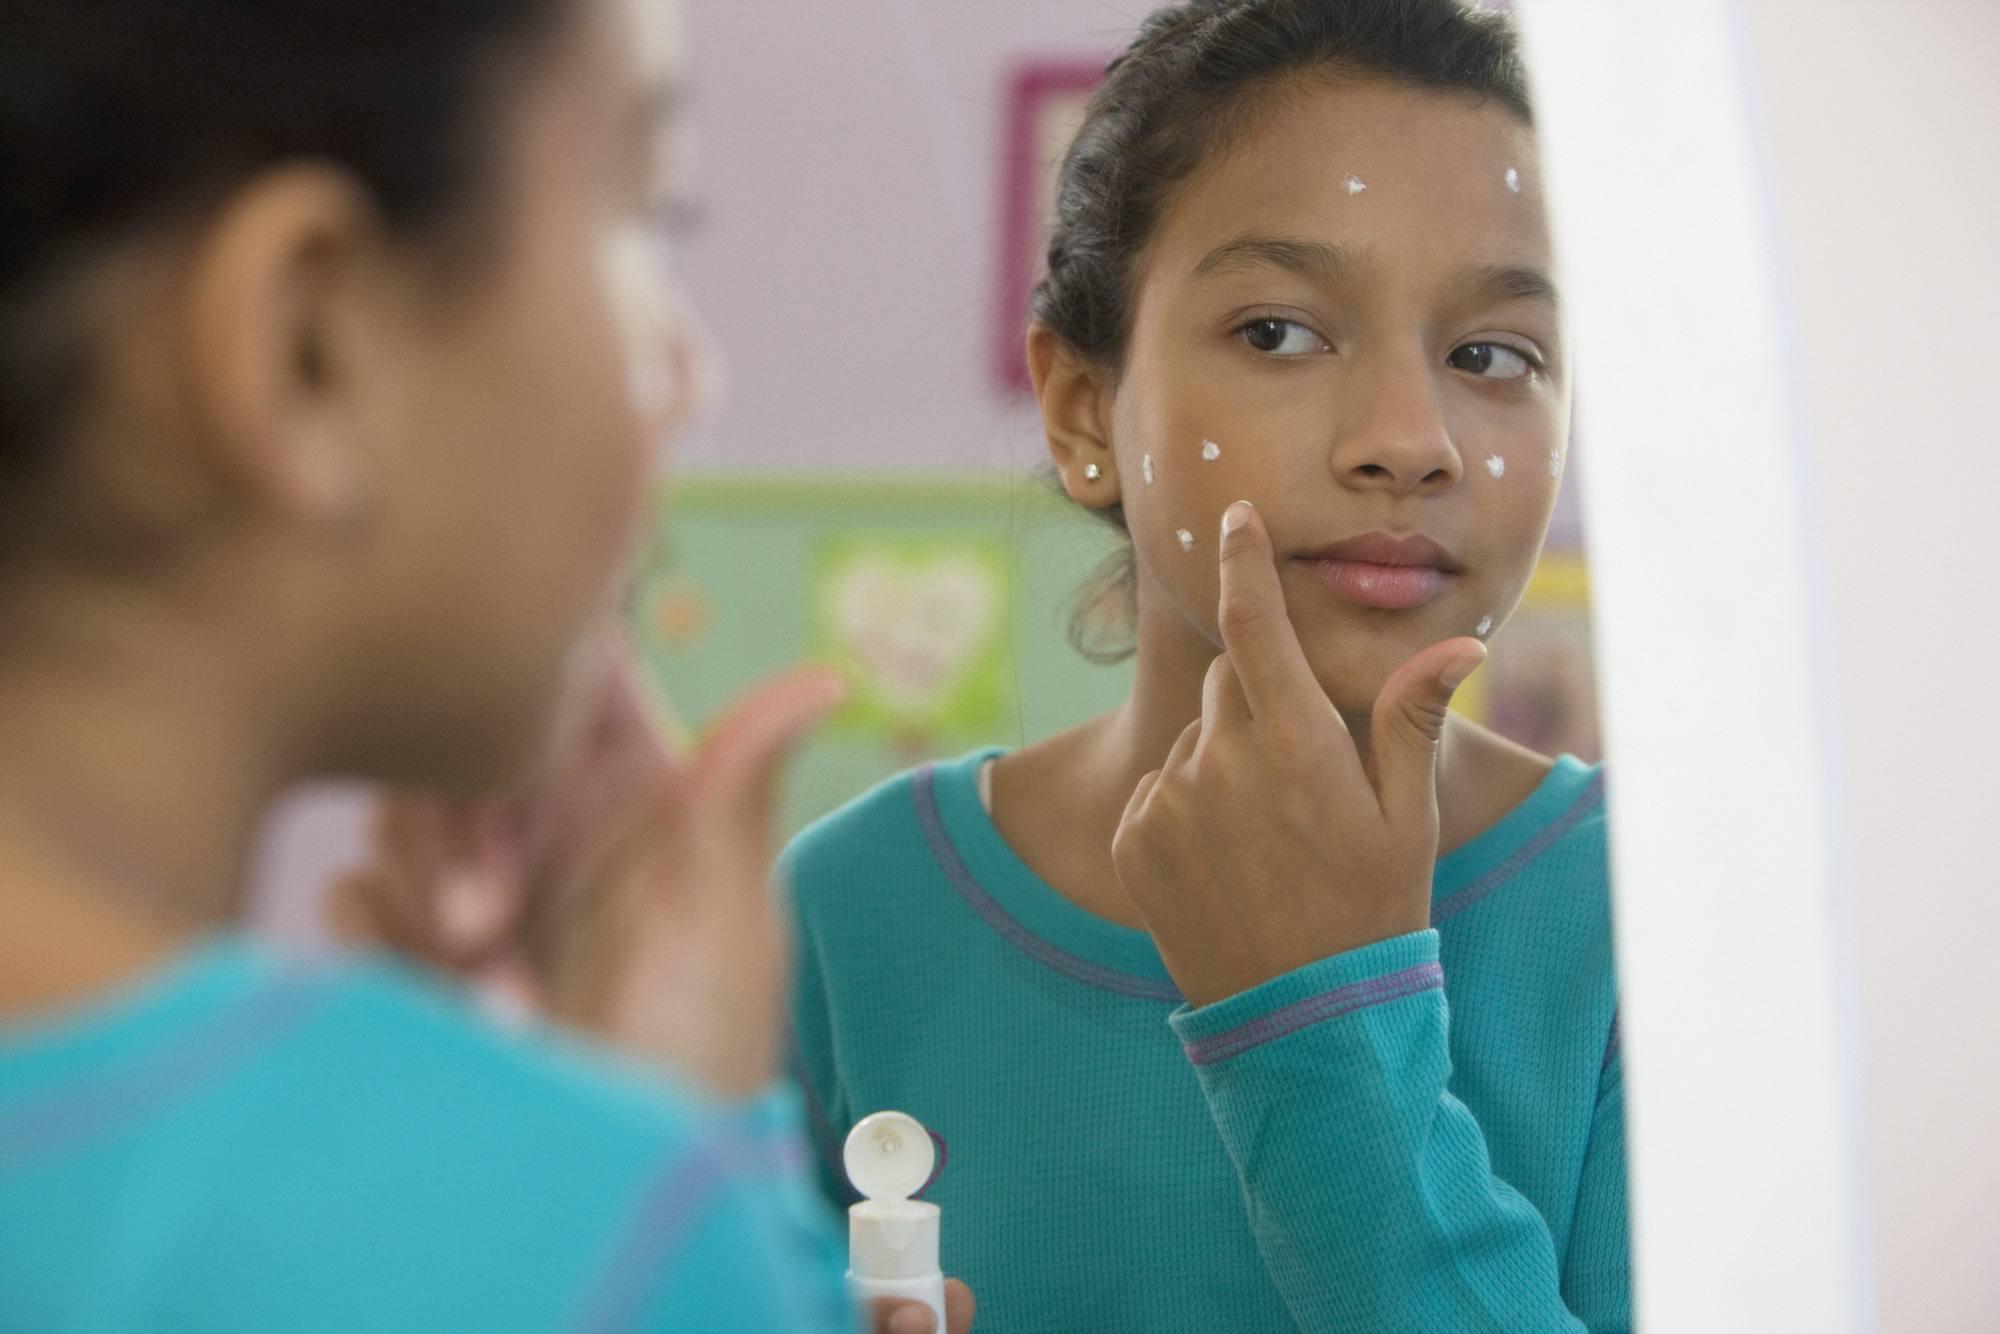 Hispanic girl putting on acne cream